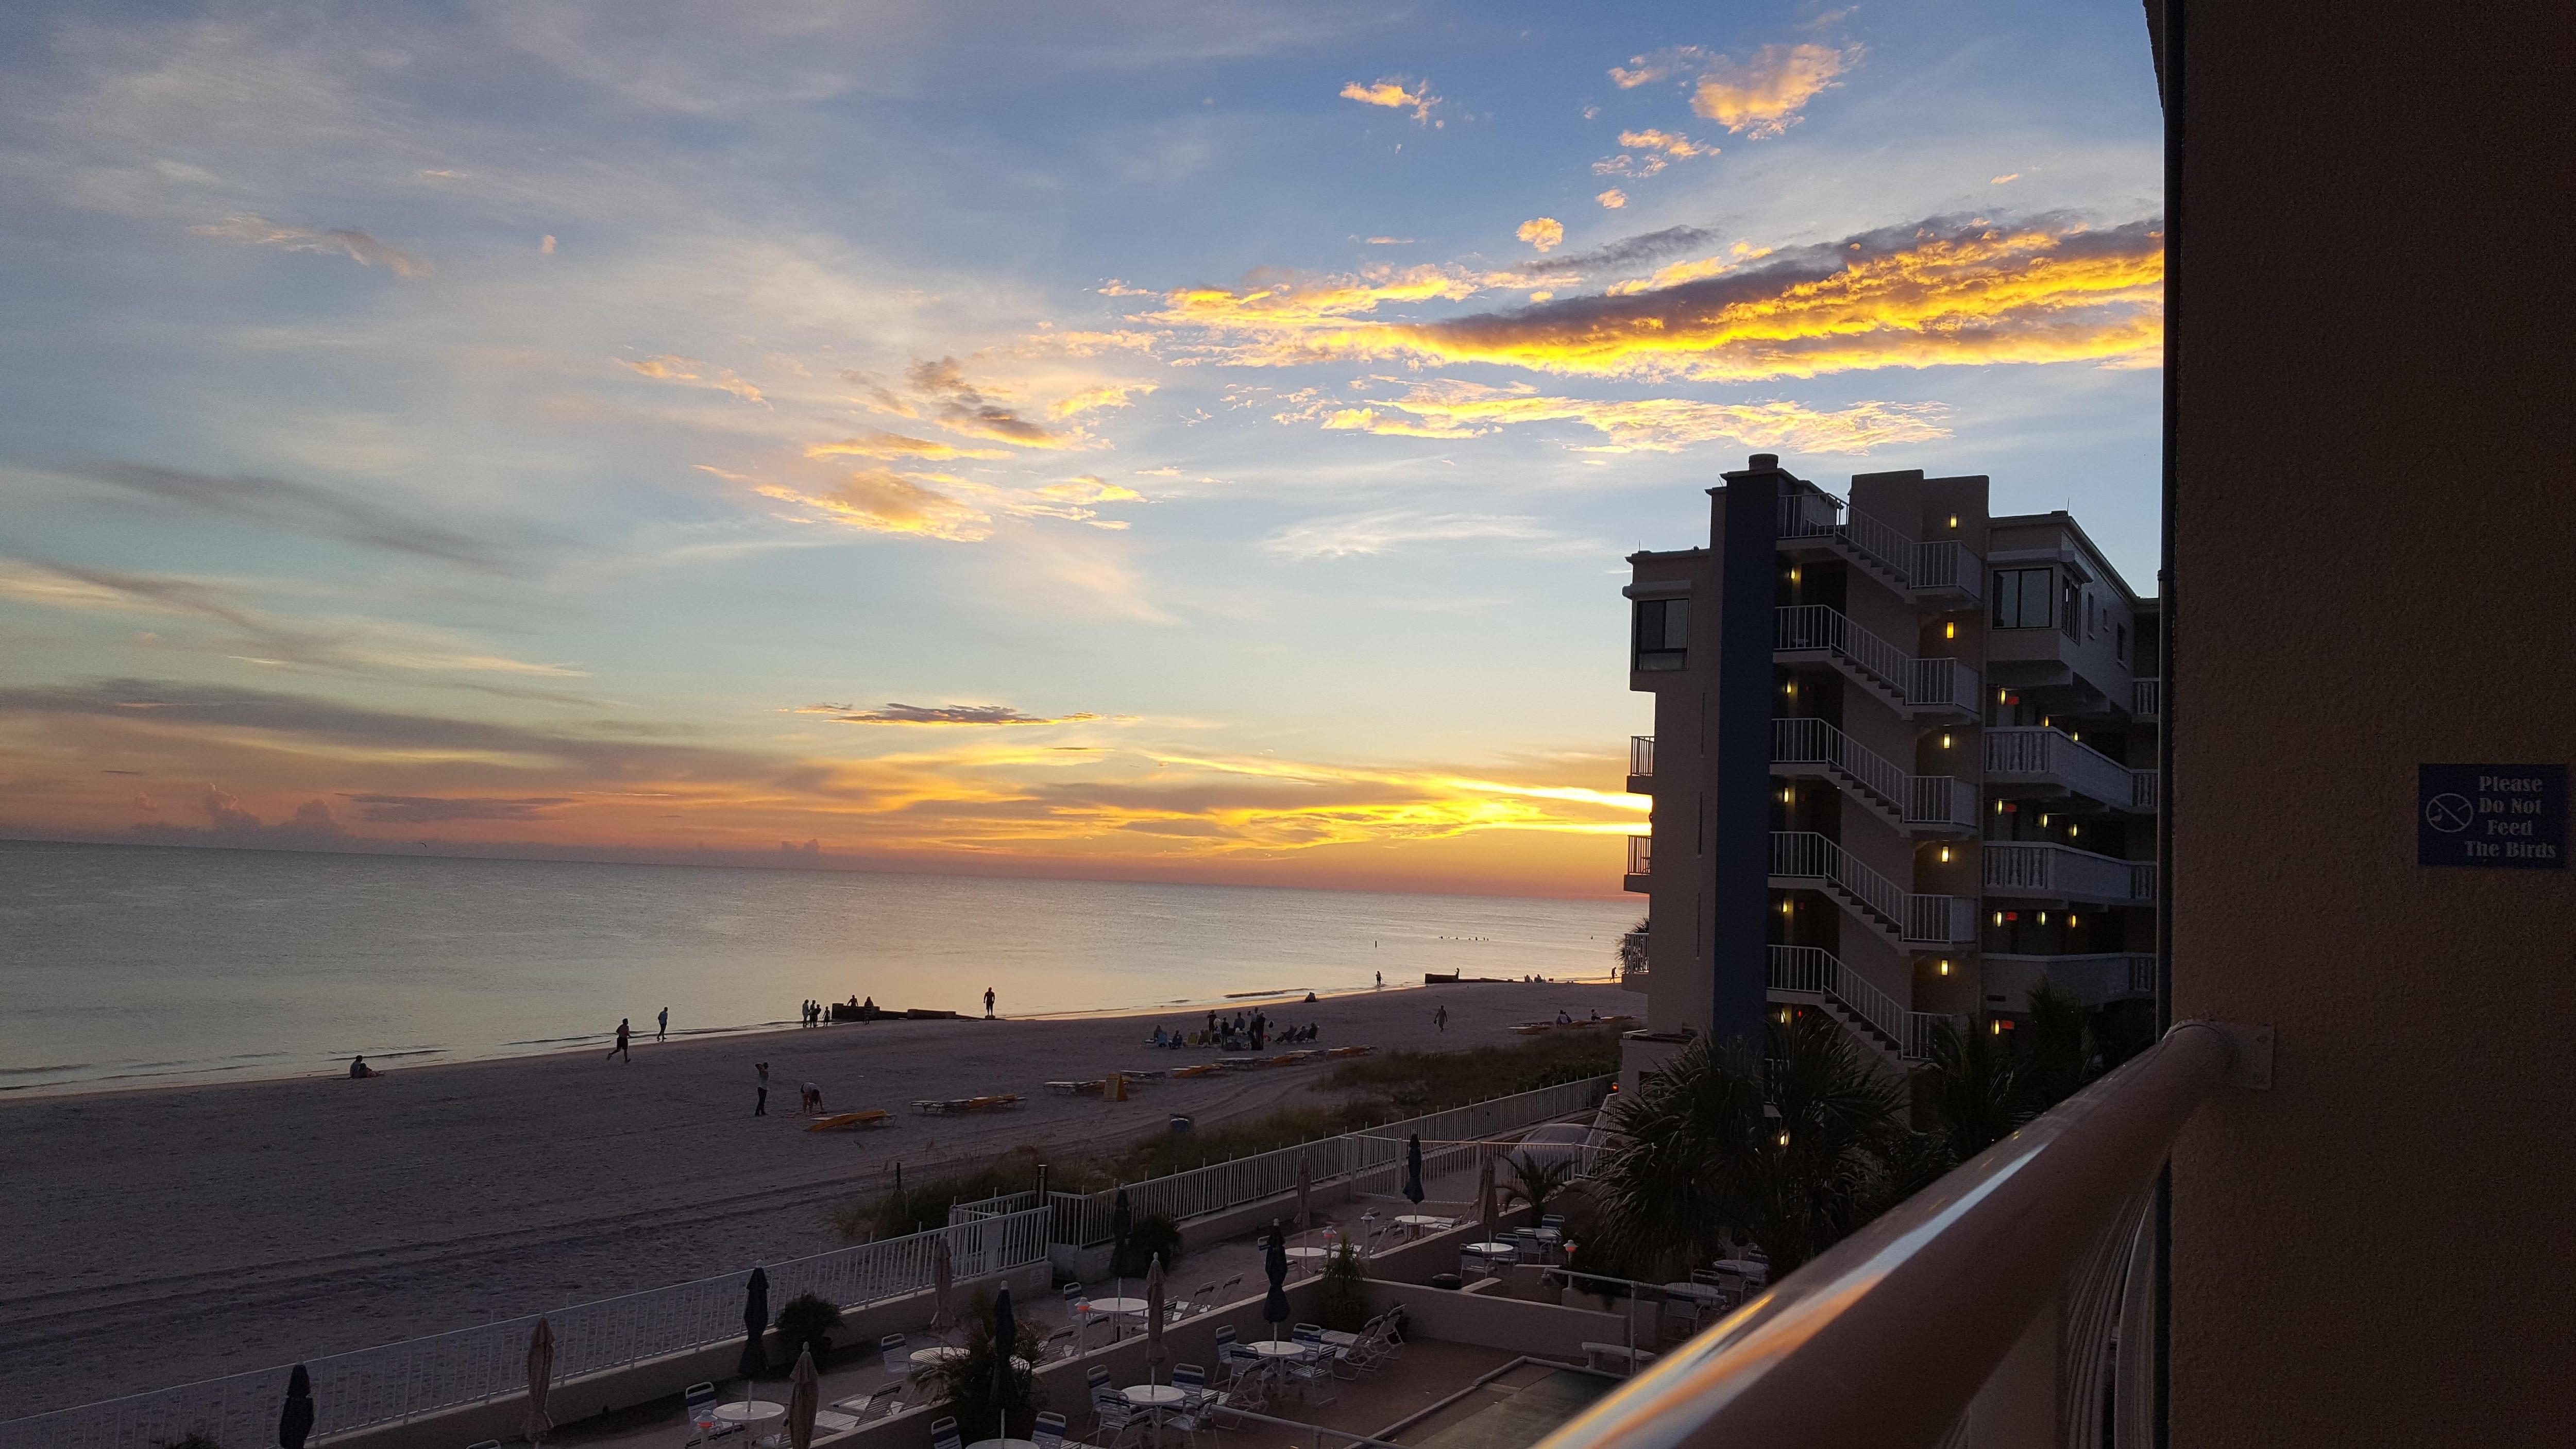 Sunset off balcony